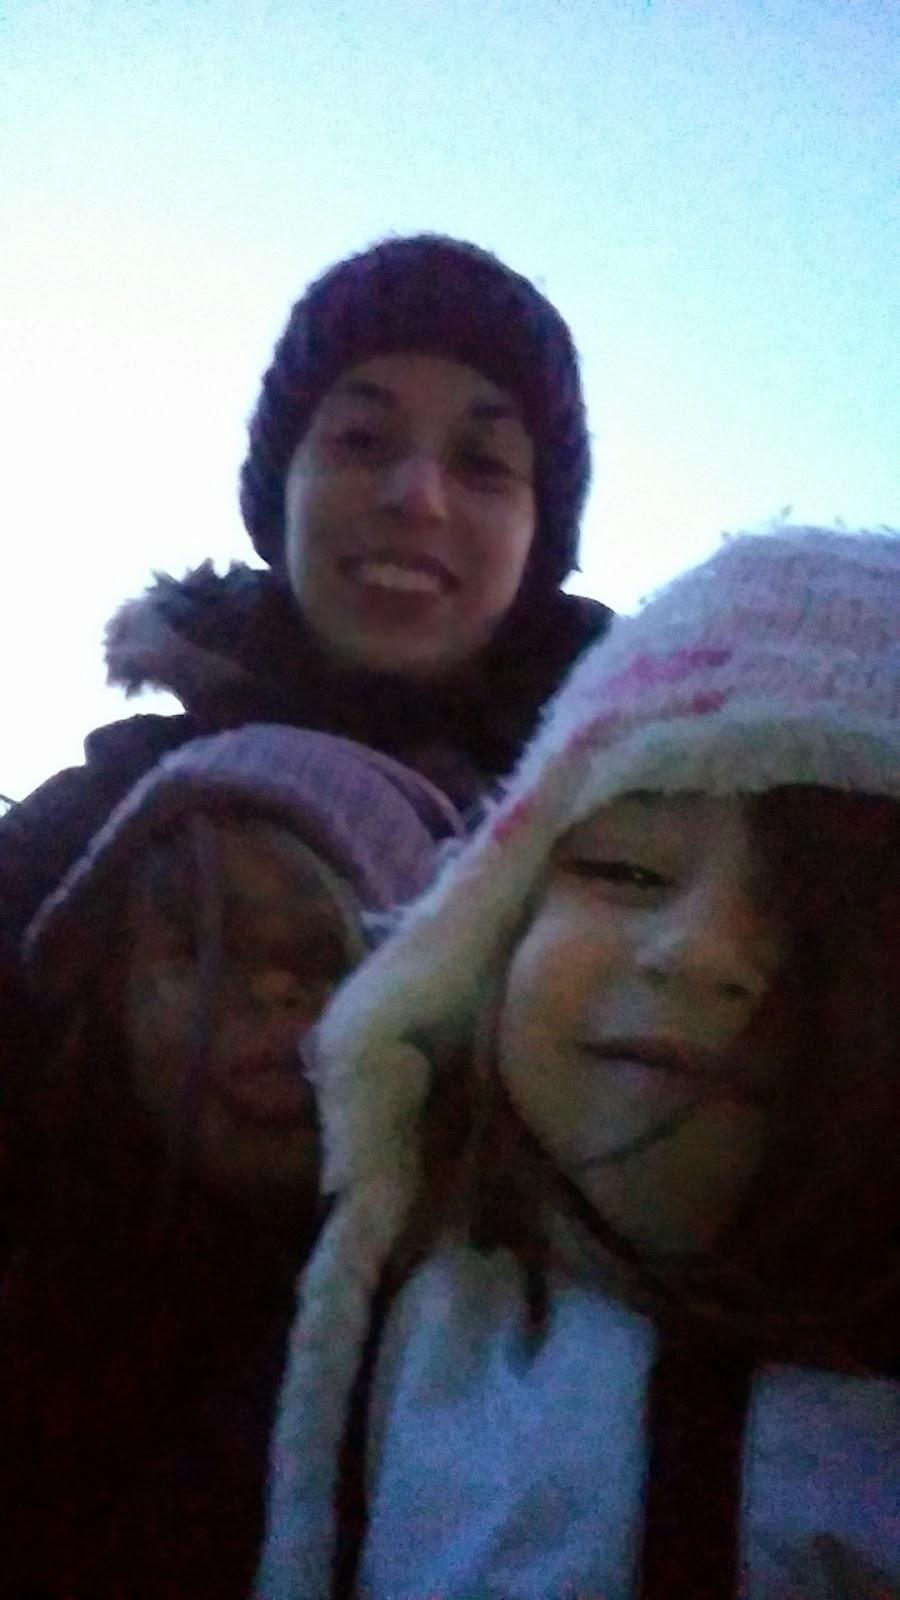 sledge selfie